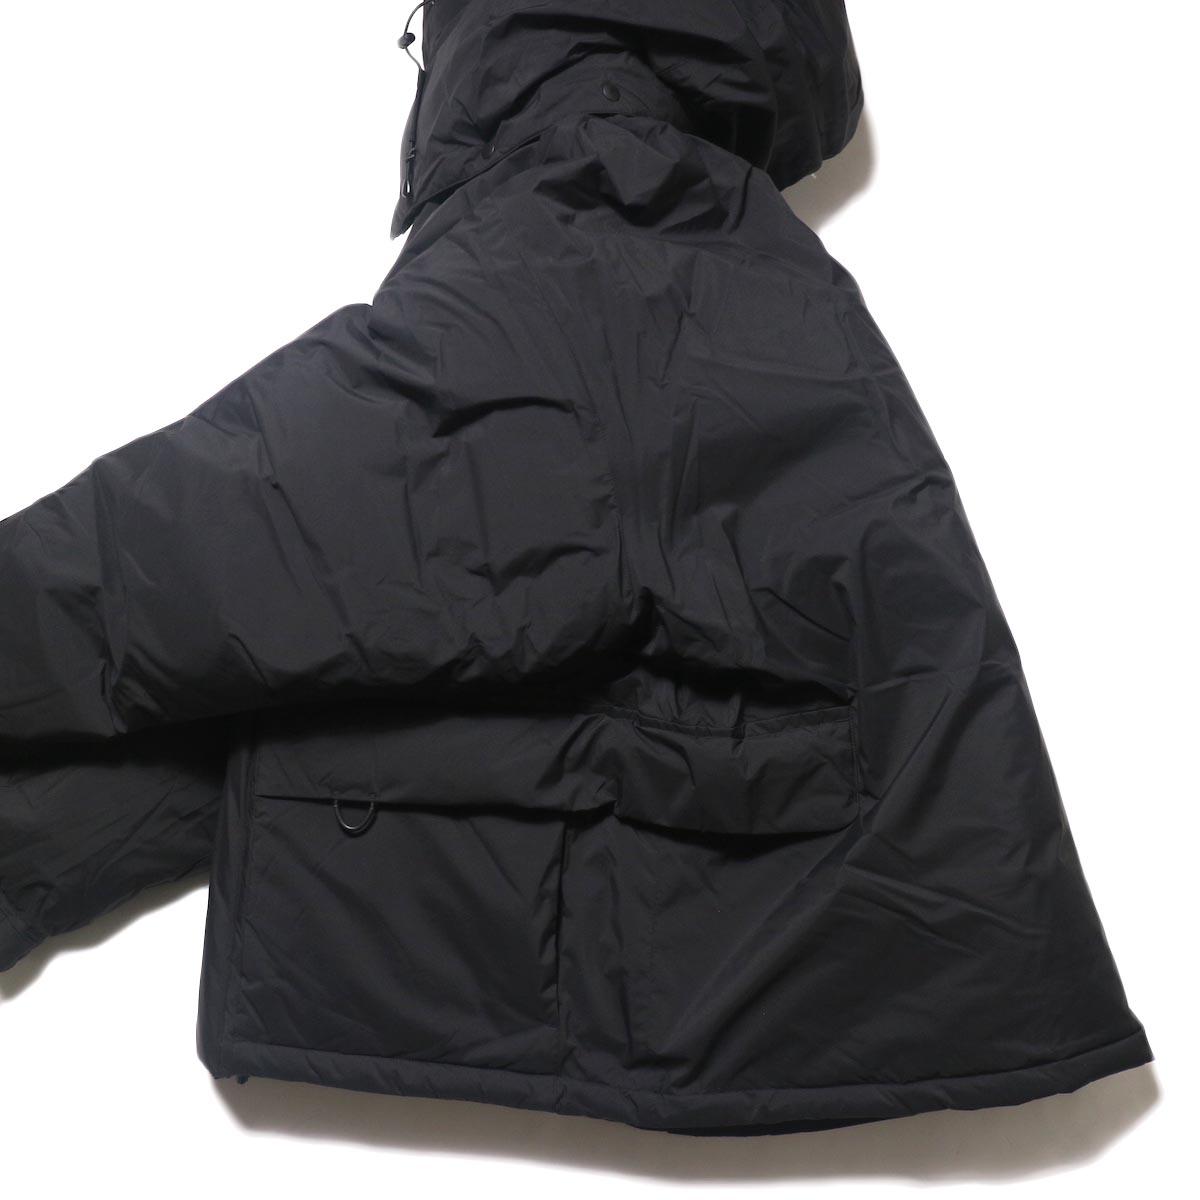 DAIWA PIER39 / GORE-TEX INFINIUM EXPEDITION DOWN JACKET (Black)横ポケット